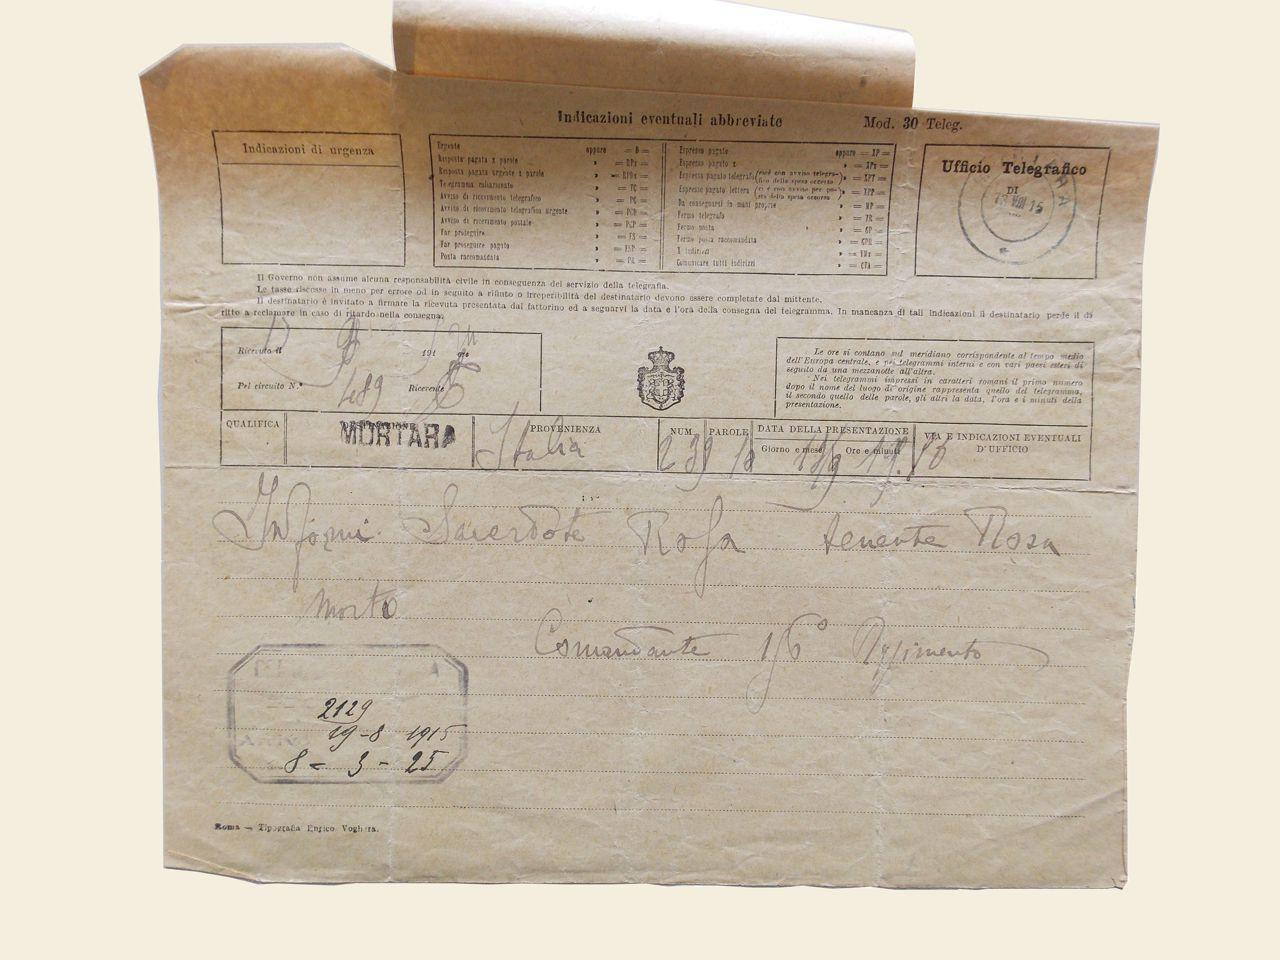 telegramma-avvenuto-decesso-rosa-giuseppe